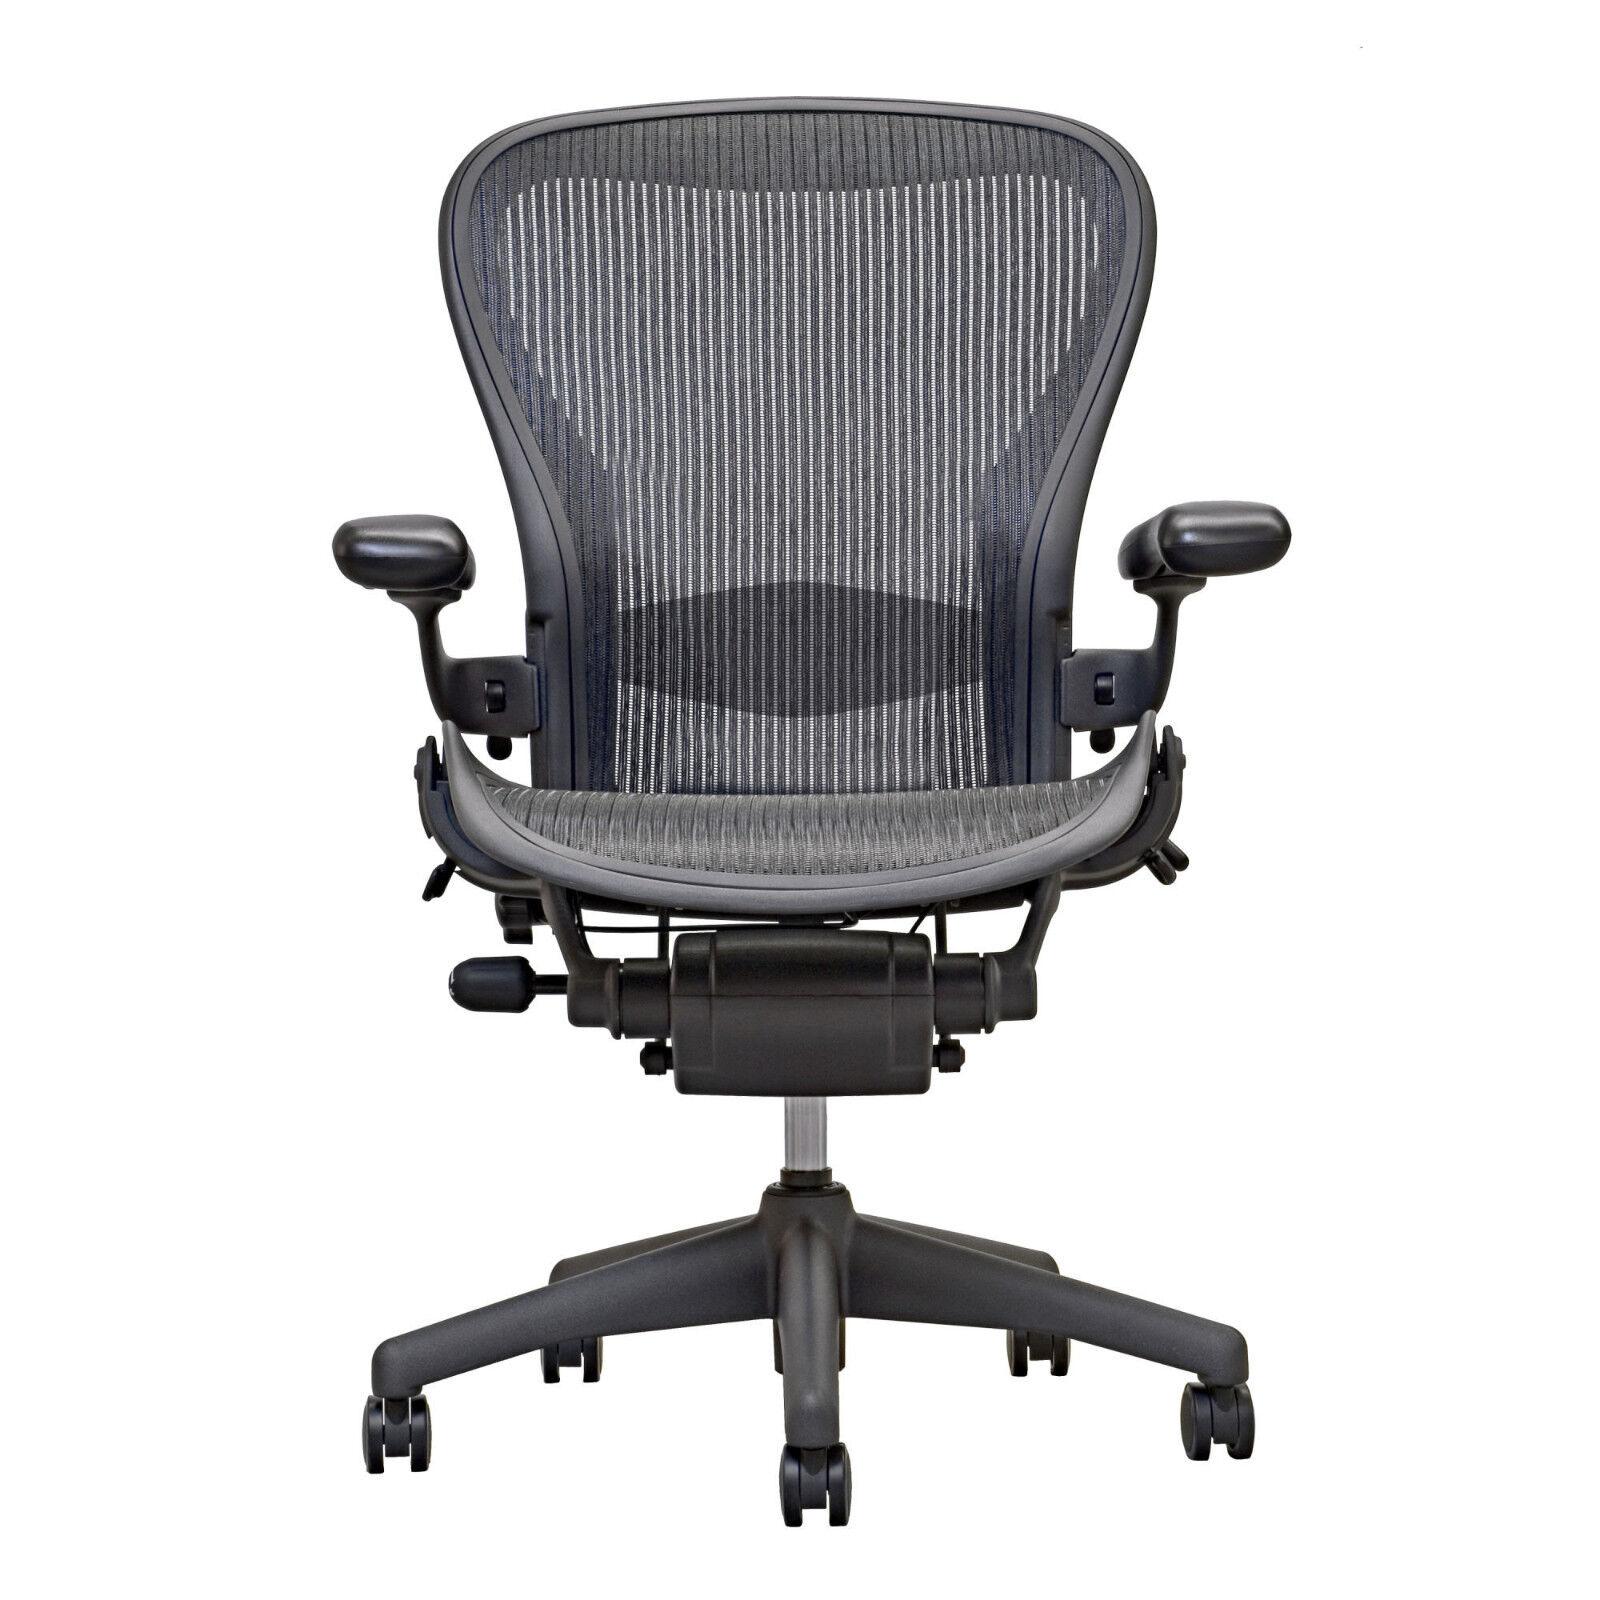 aeron chair open box size b fully